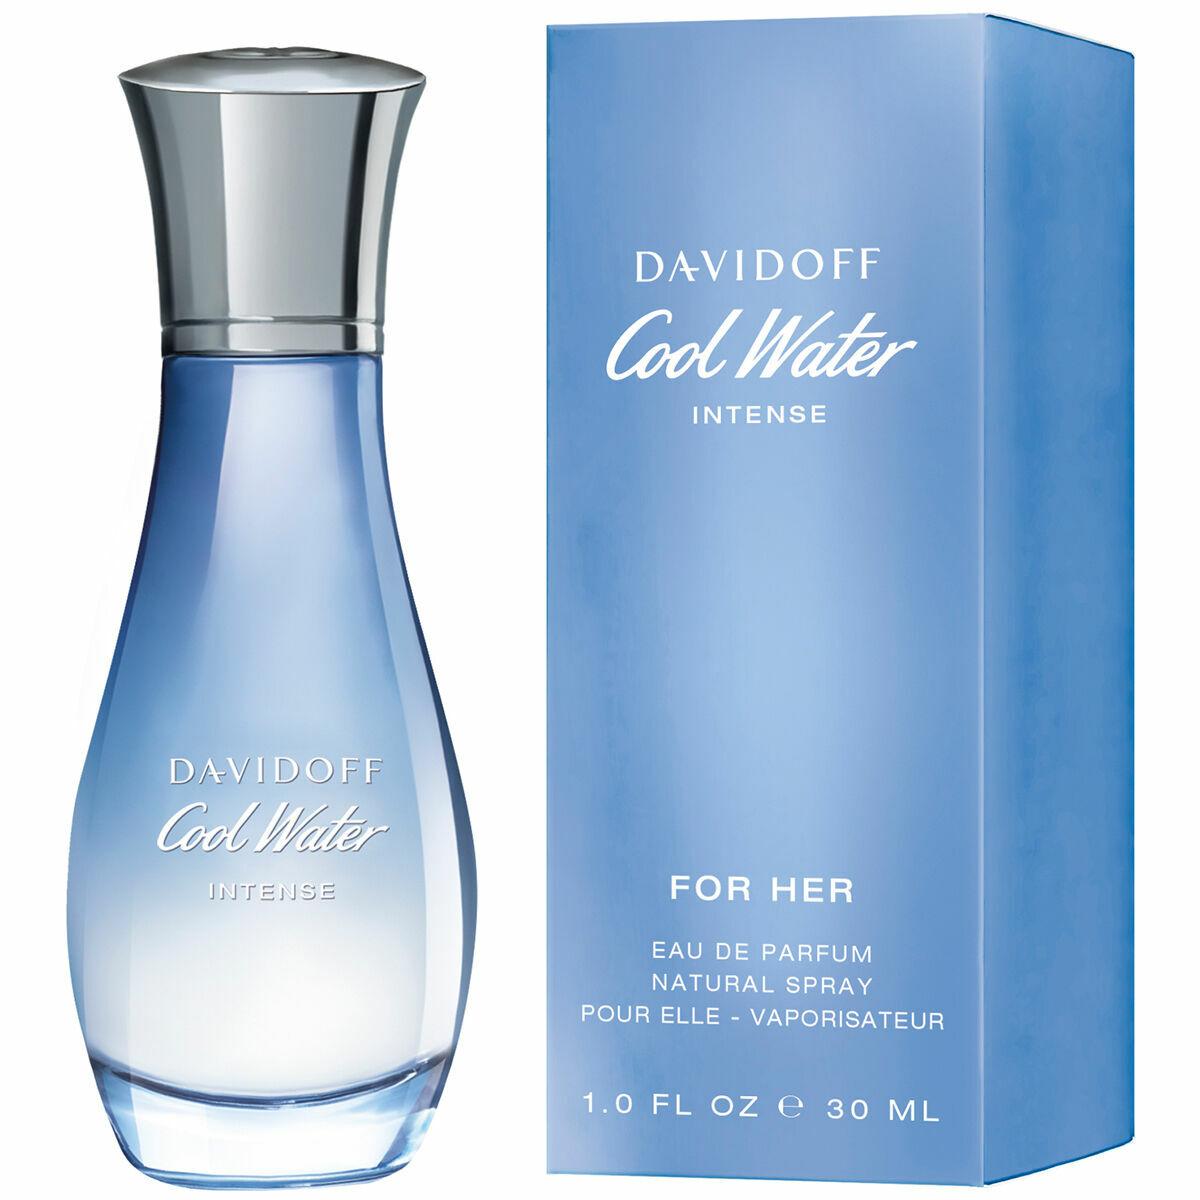 Bild 3 von Davidoff Cool Water Intense for Her, Eau de Parfum